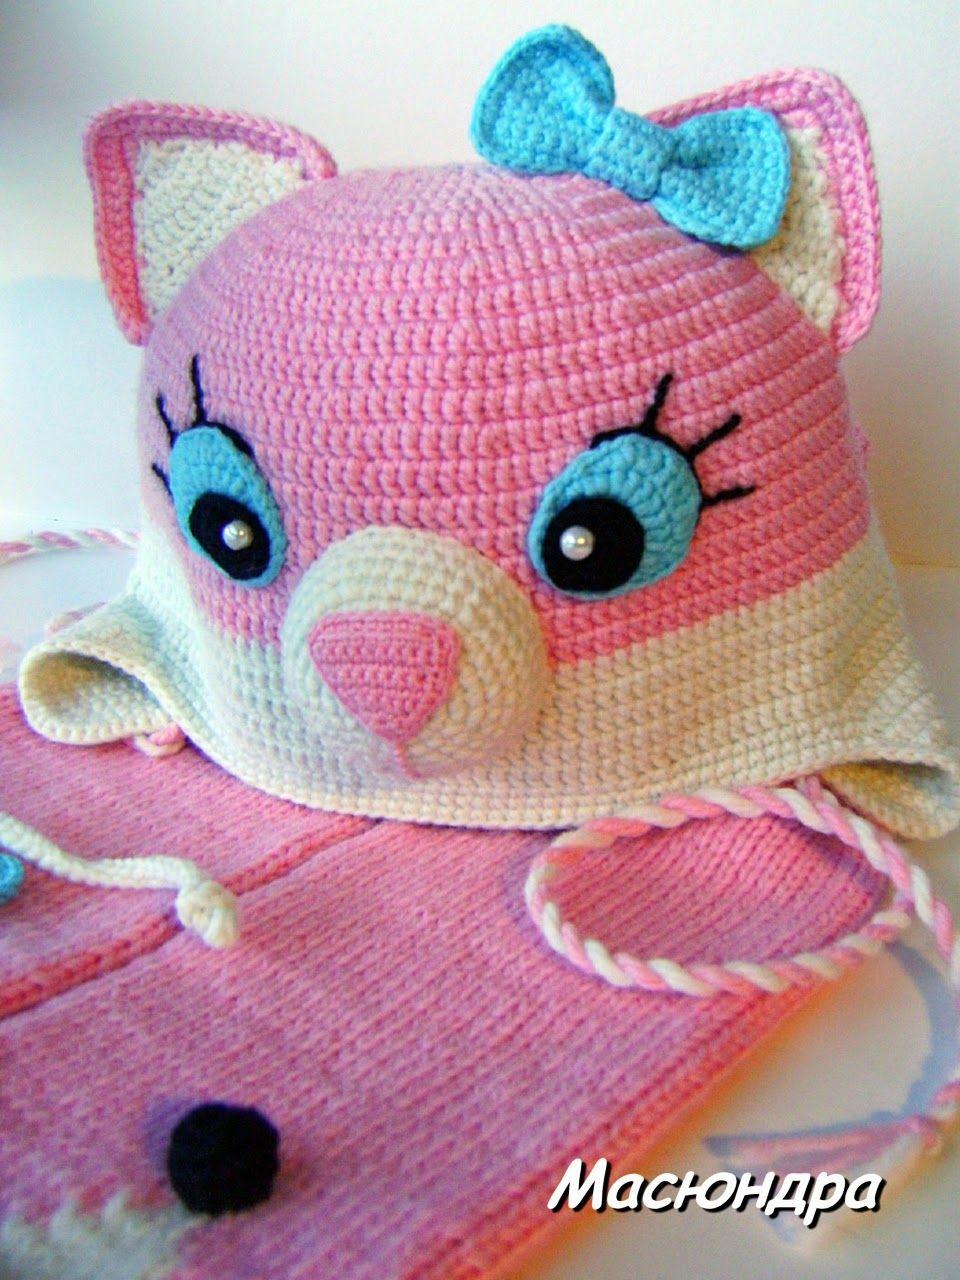 Croche pro Bebe  Gorros e chapéu em croche achados na net  3edd14d26b3